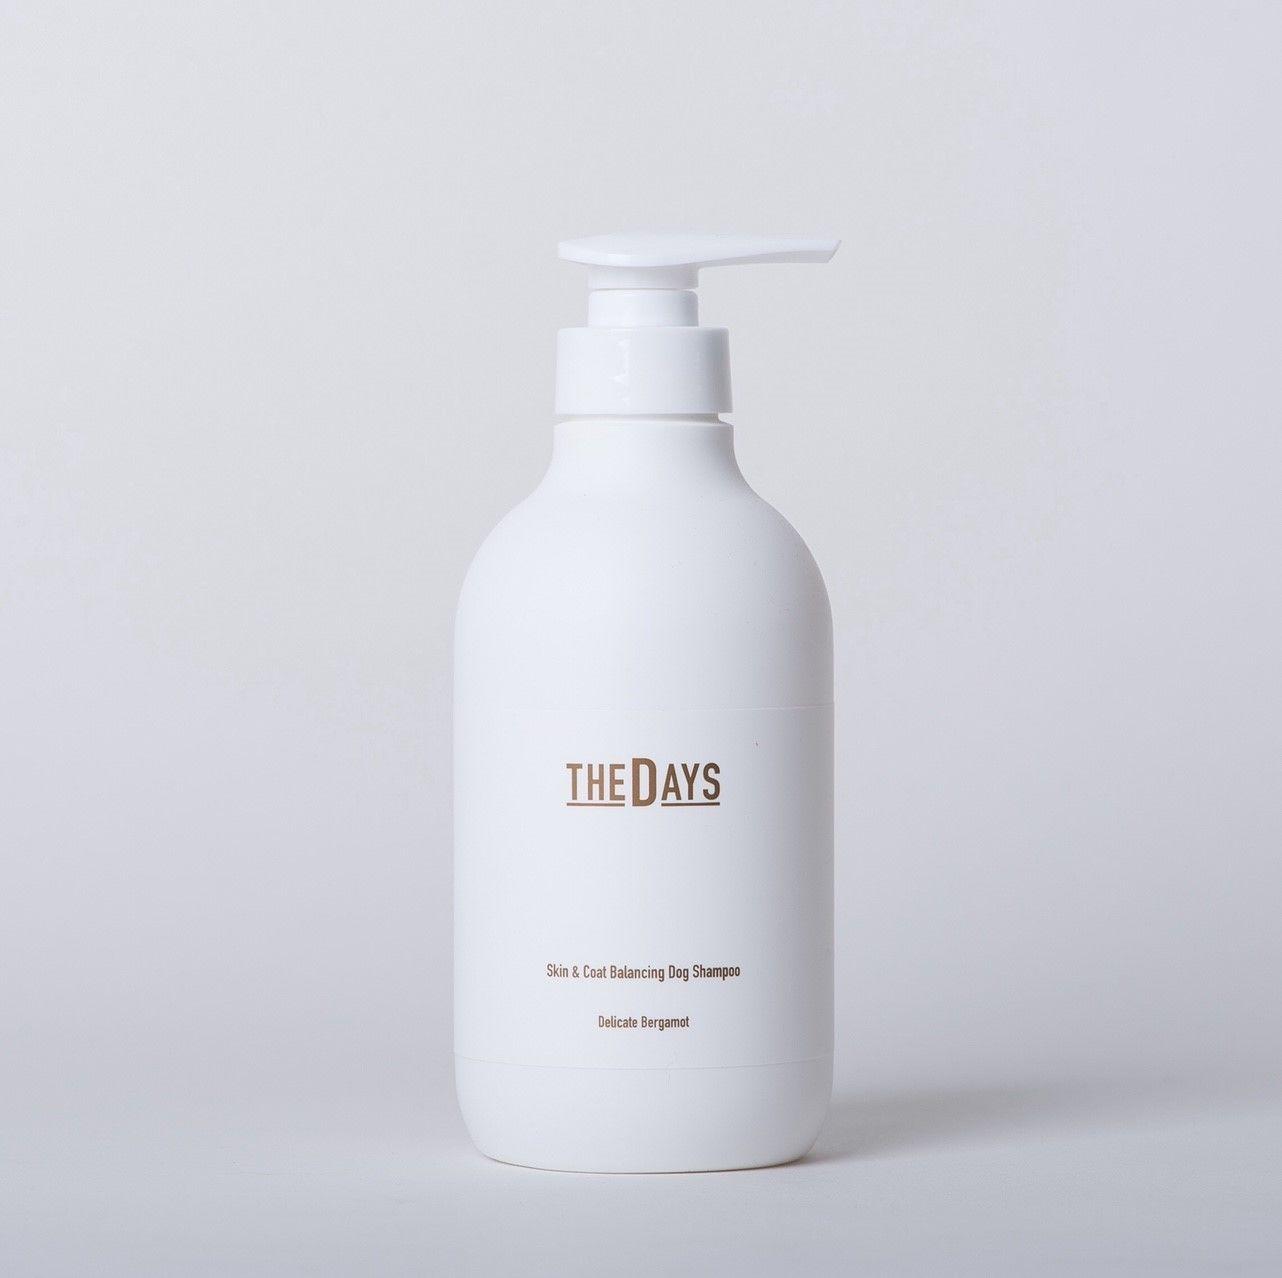 500ml】THE DAYS 犬用シャンプー ベルガモットの香り/Natural DOG Shampoo